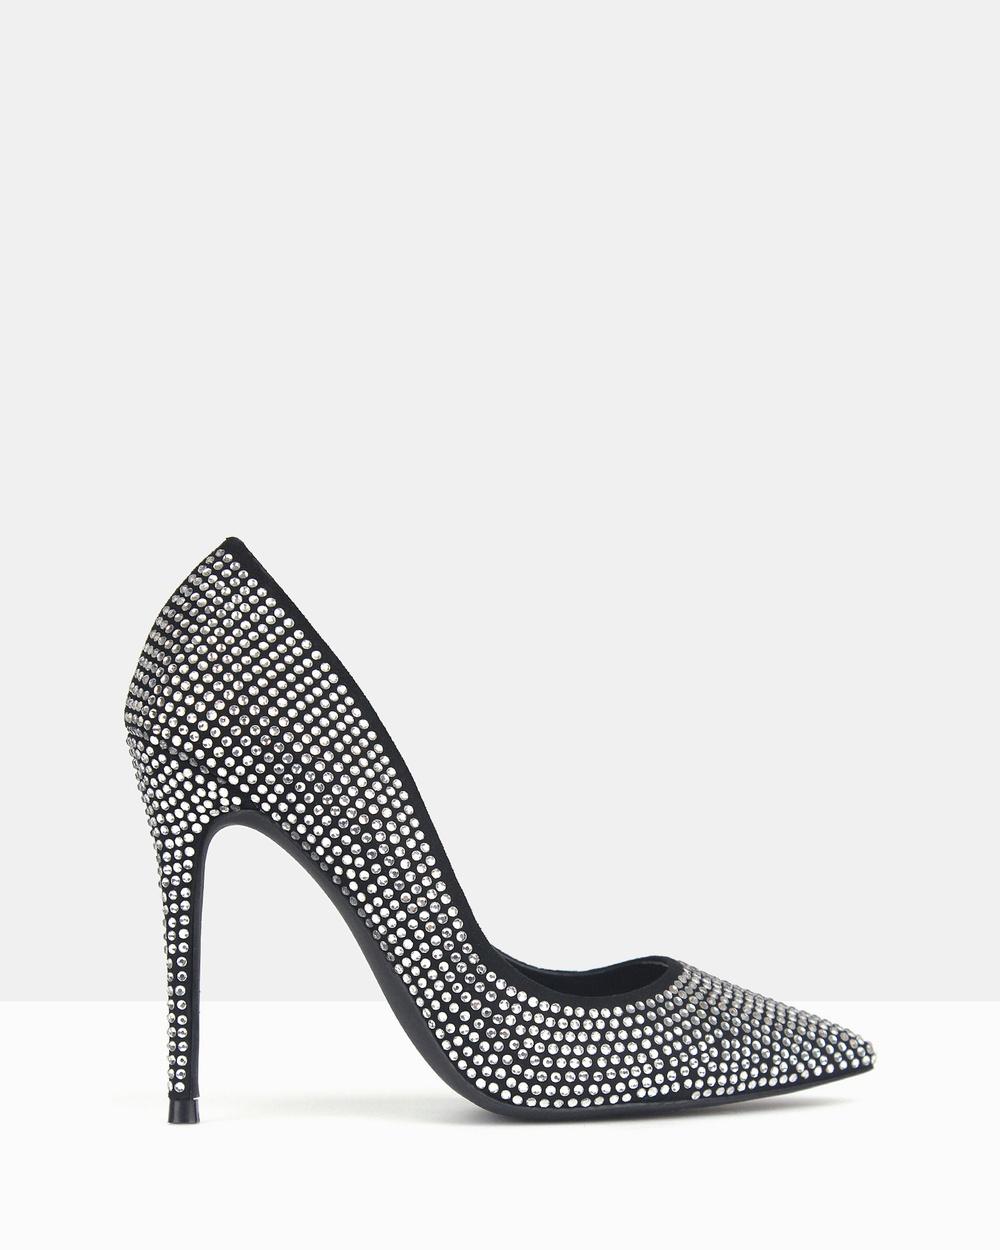 Betts Blossom 2 Diamante Stiletto Heels Heels Black Diamante Blossom 2 Diamante Stiletto Heels